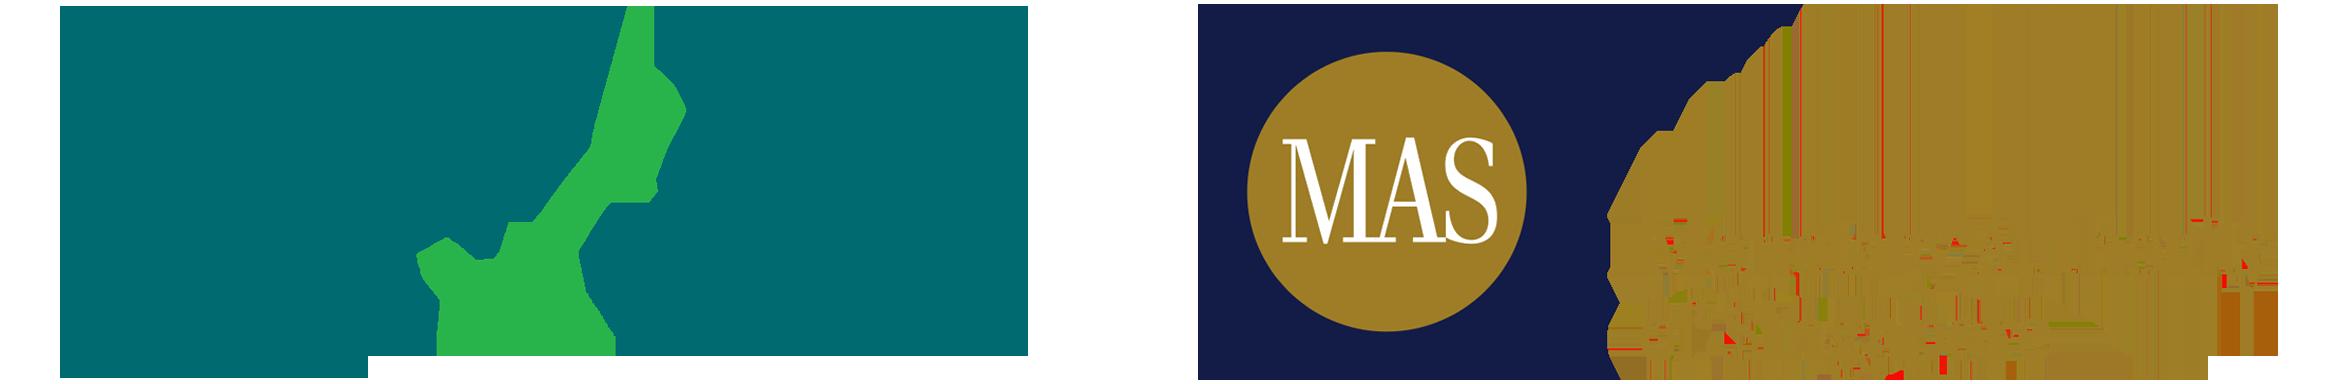 PCI-DSS and Monetary Authority of Singapore (MAS) Logo